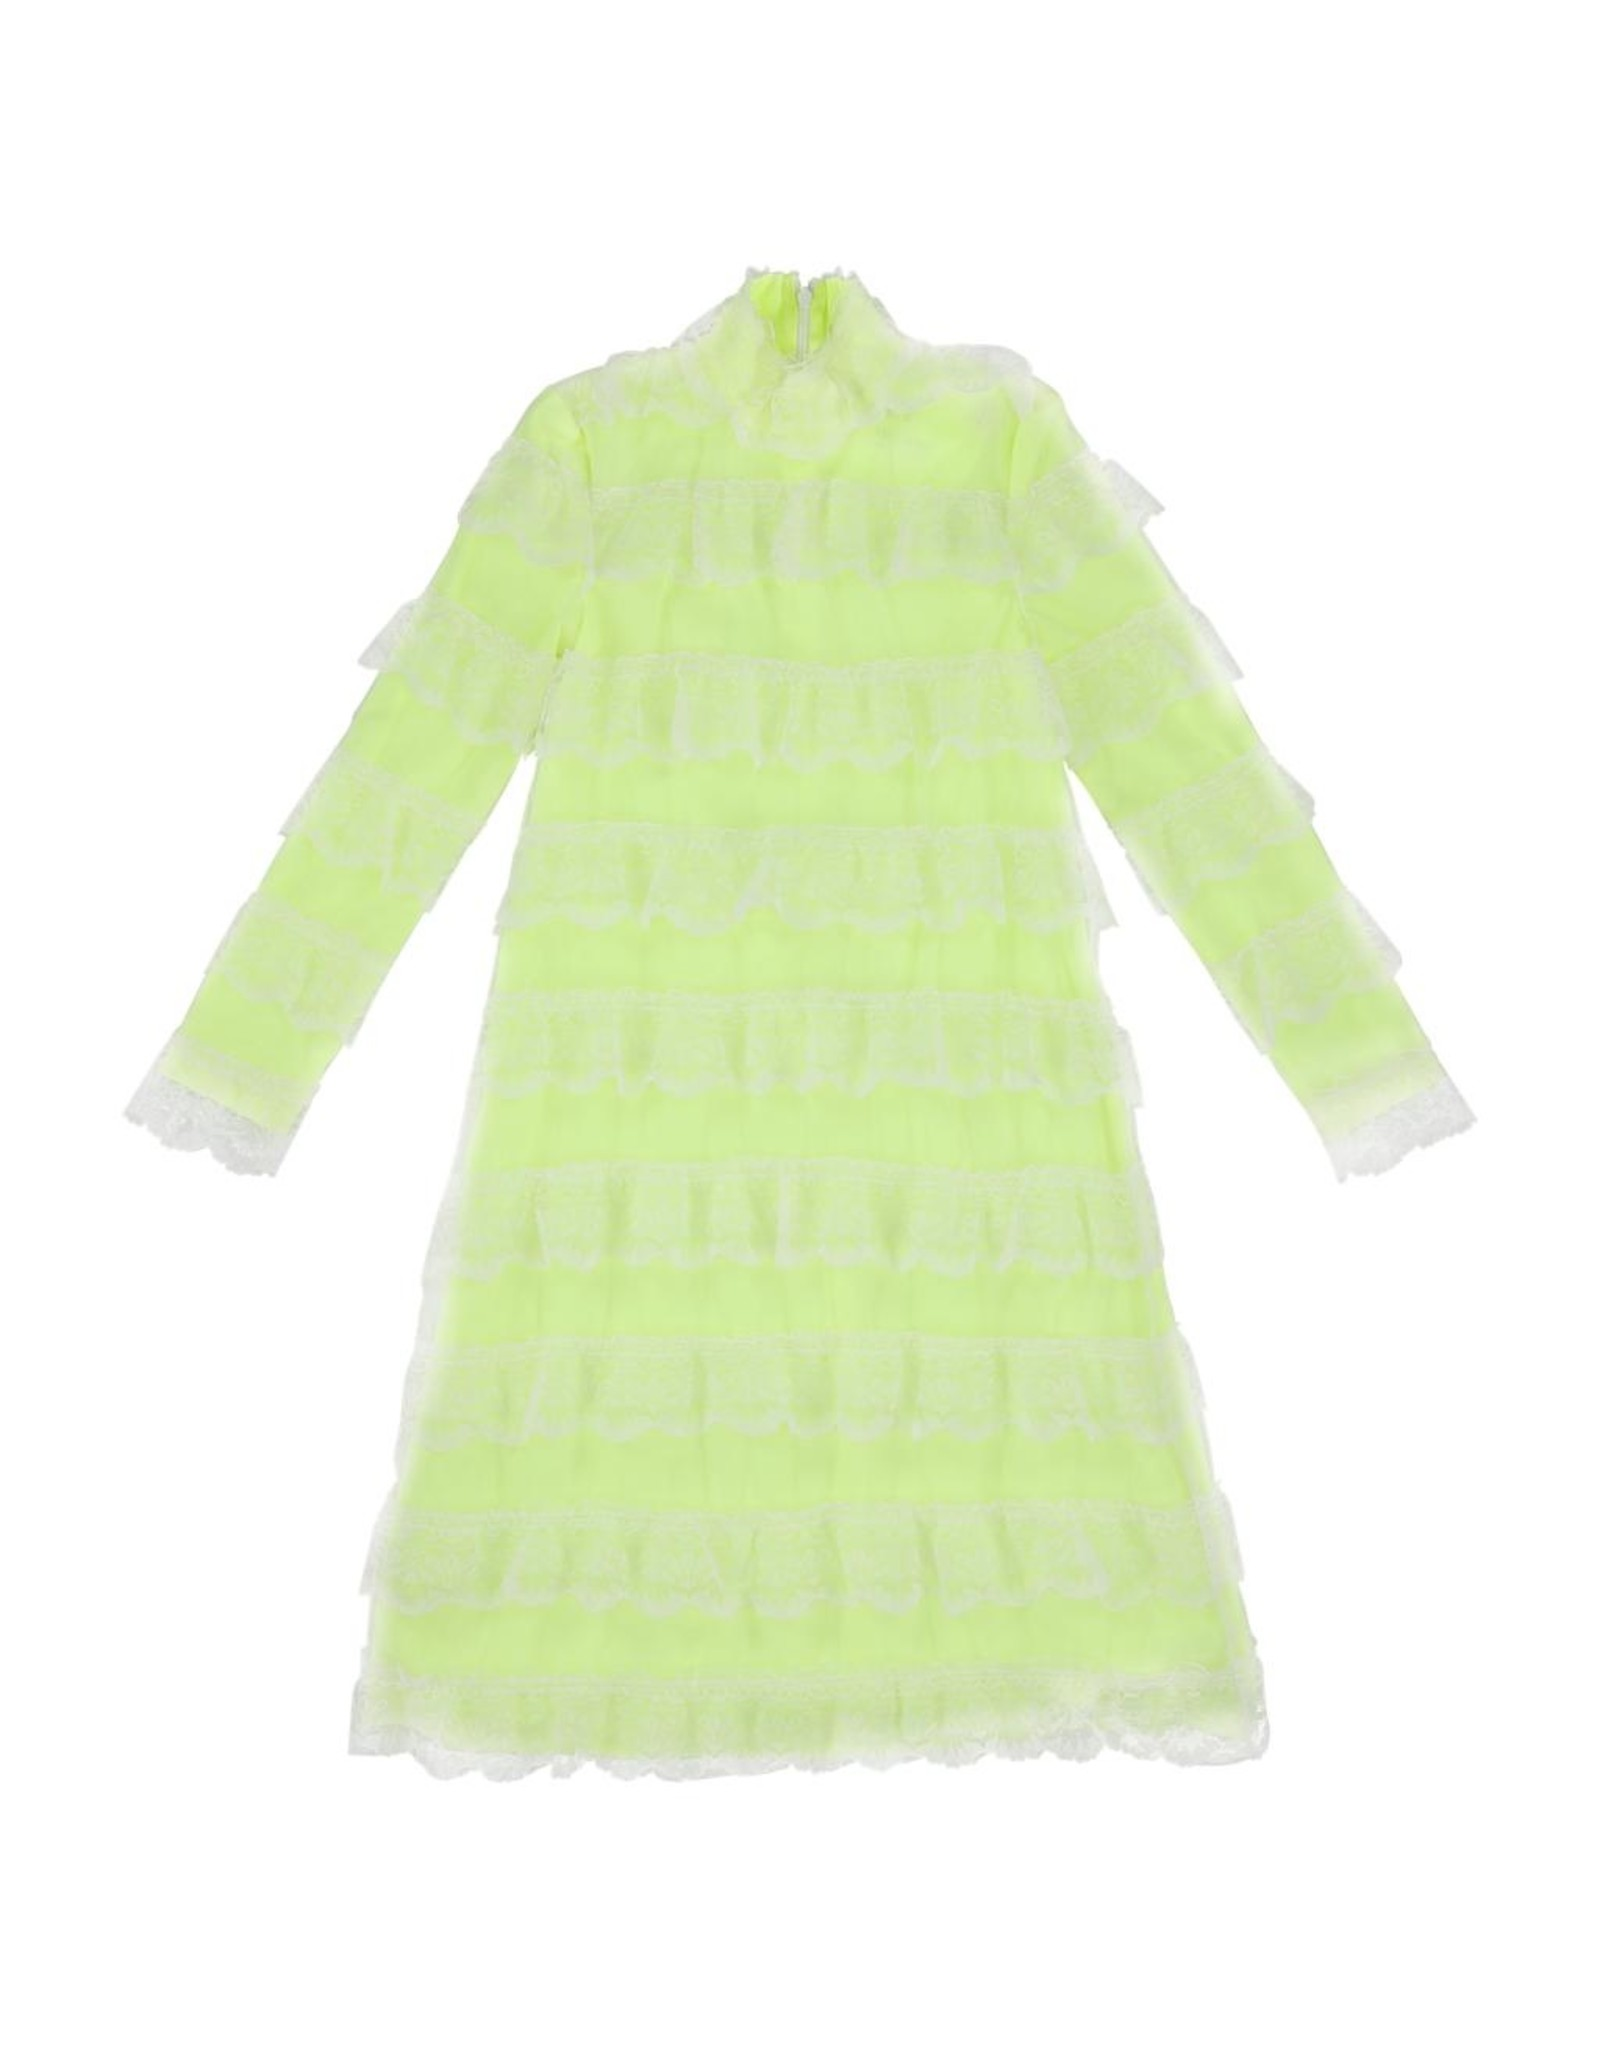 Caroline Bosmans CRLNBSMNS PS21 4067556 broderie dress yellow